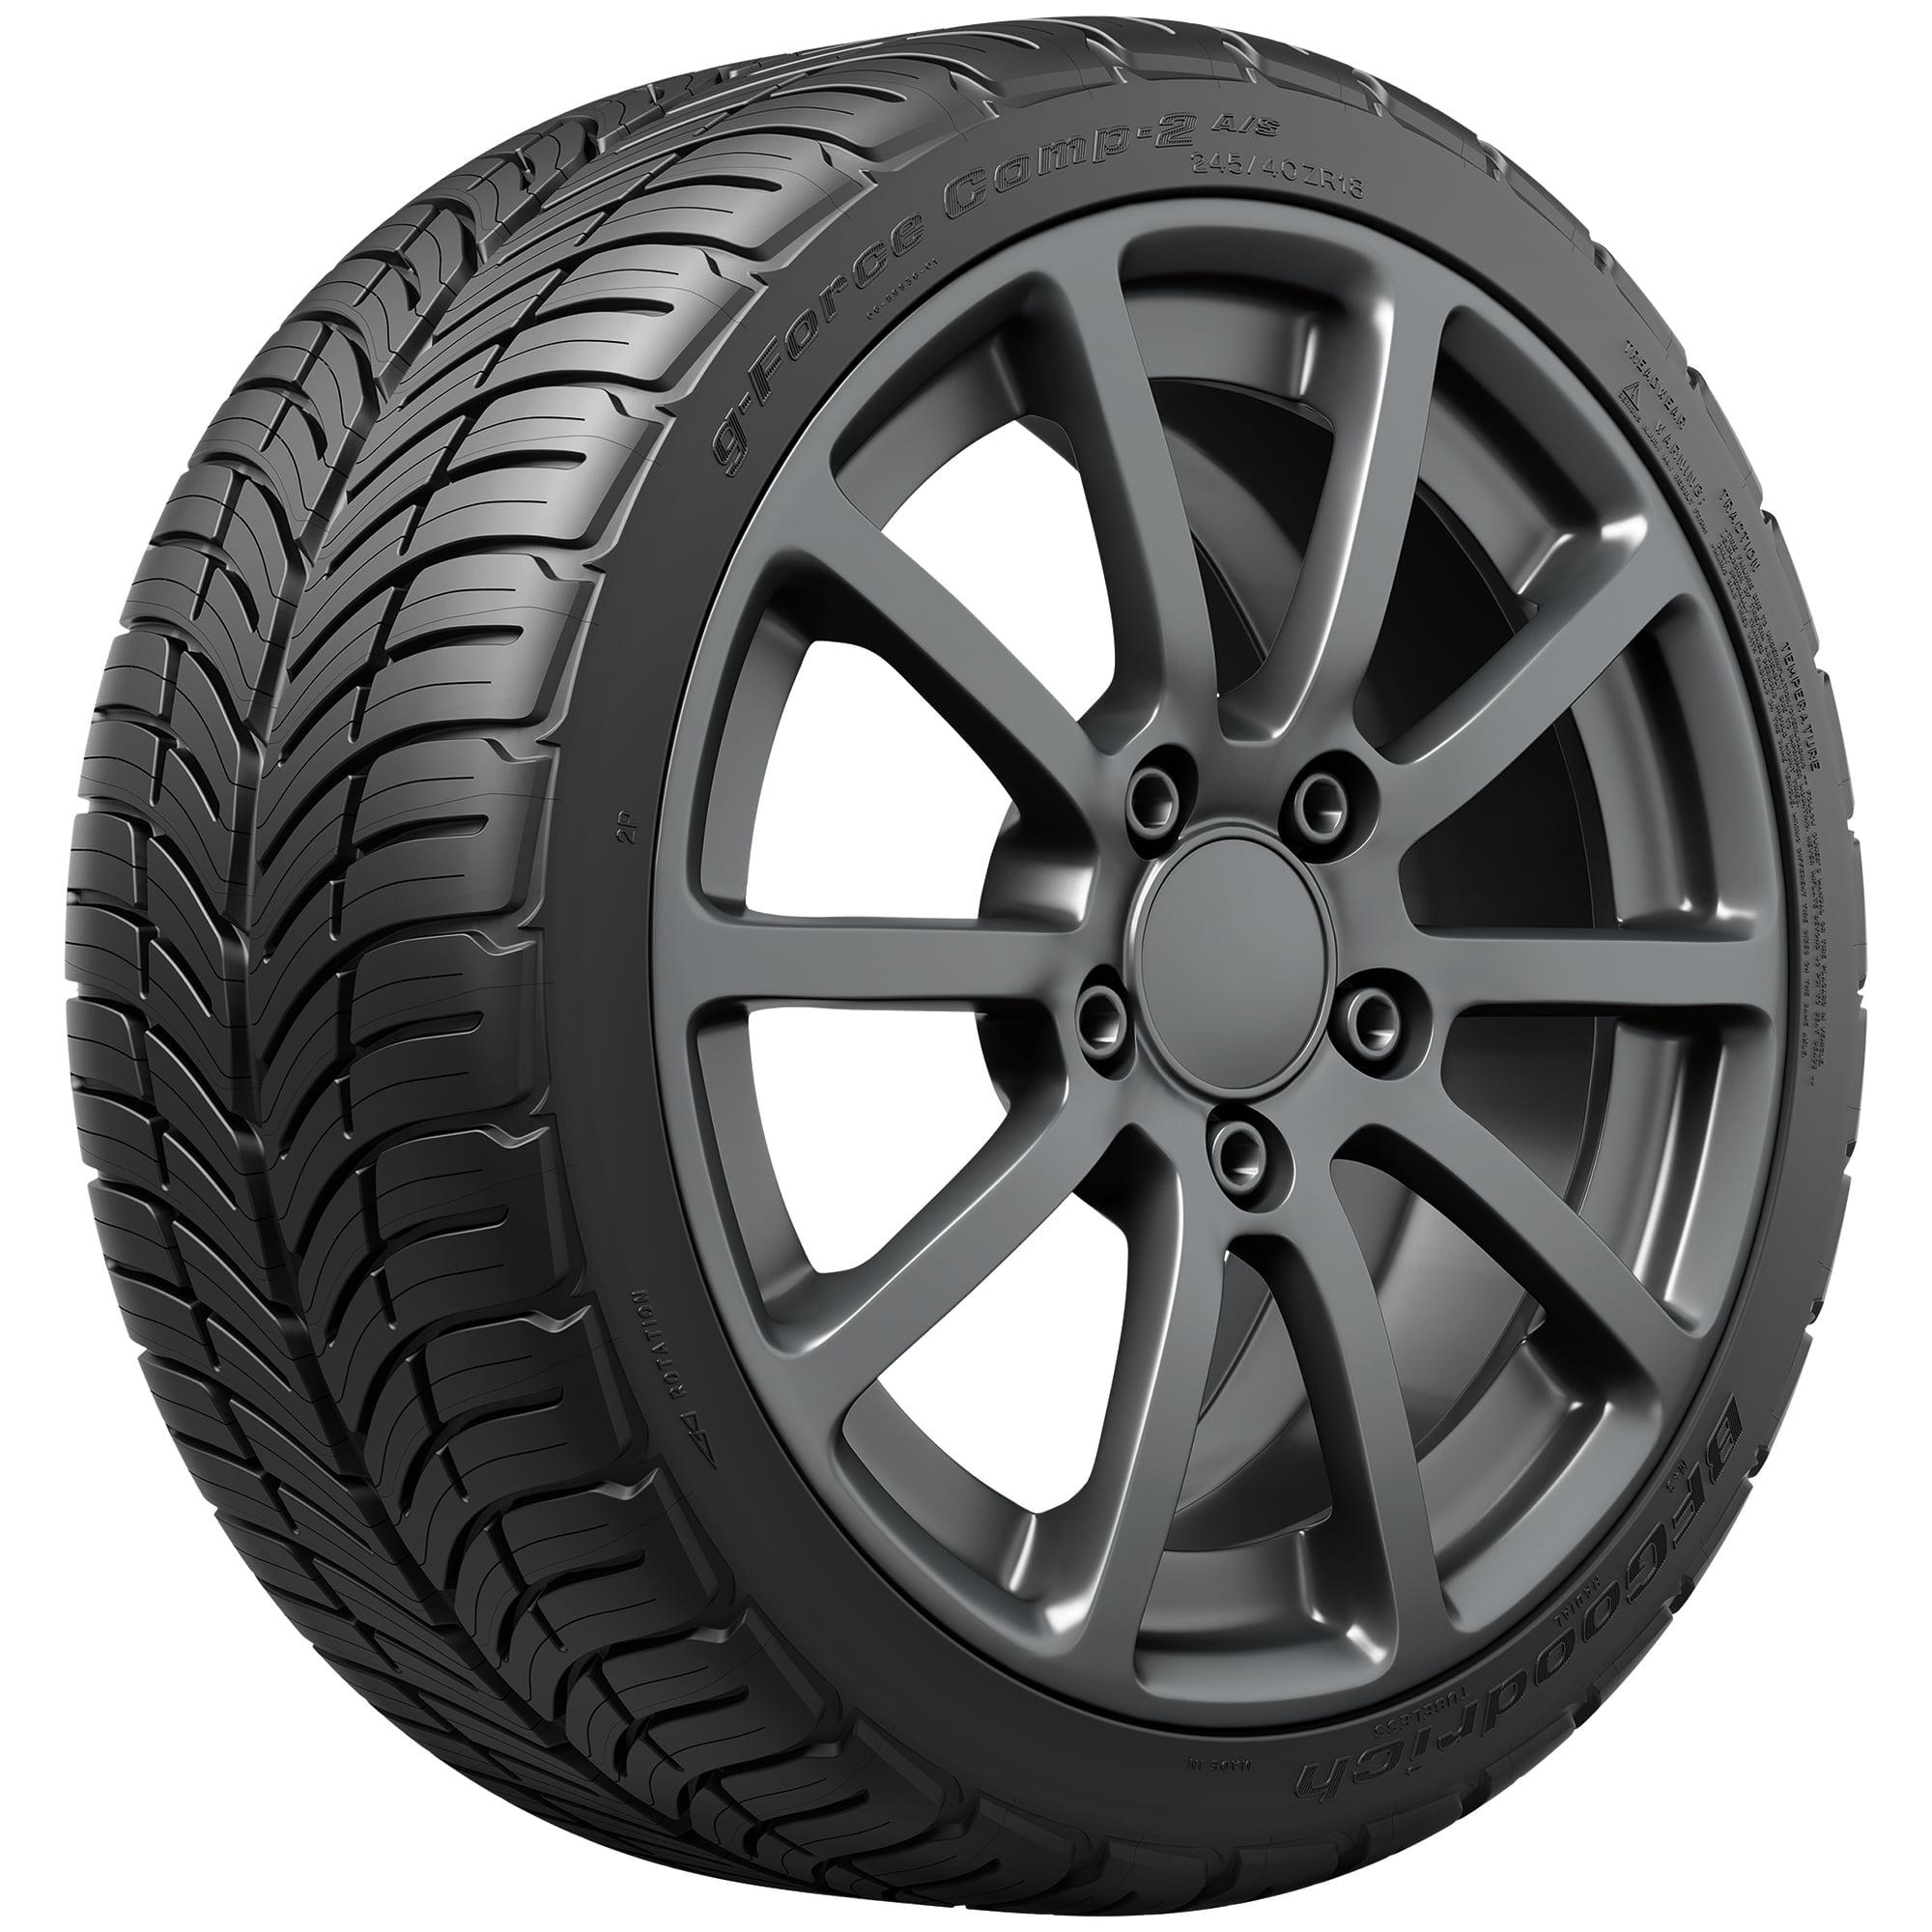 G Force Comp 2 A S >> Bfgoodrich G Force Comp 2 All Season Ultra High Performance Tire 215 55zr17 94w